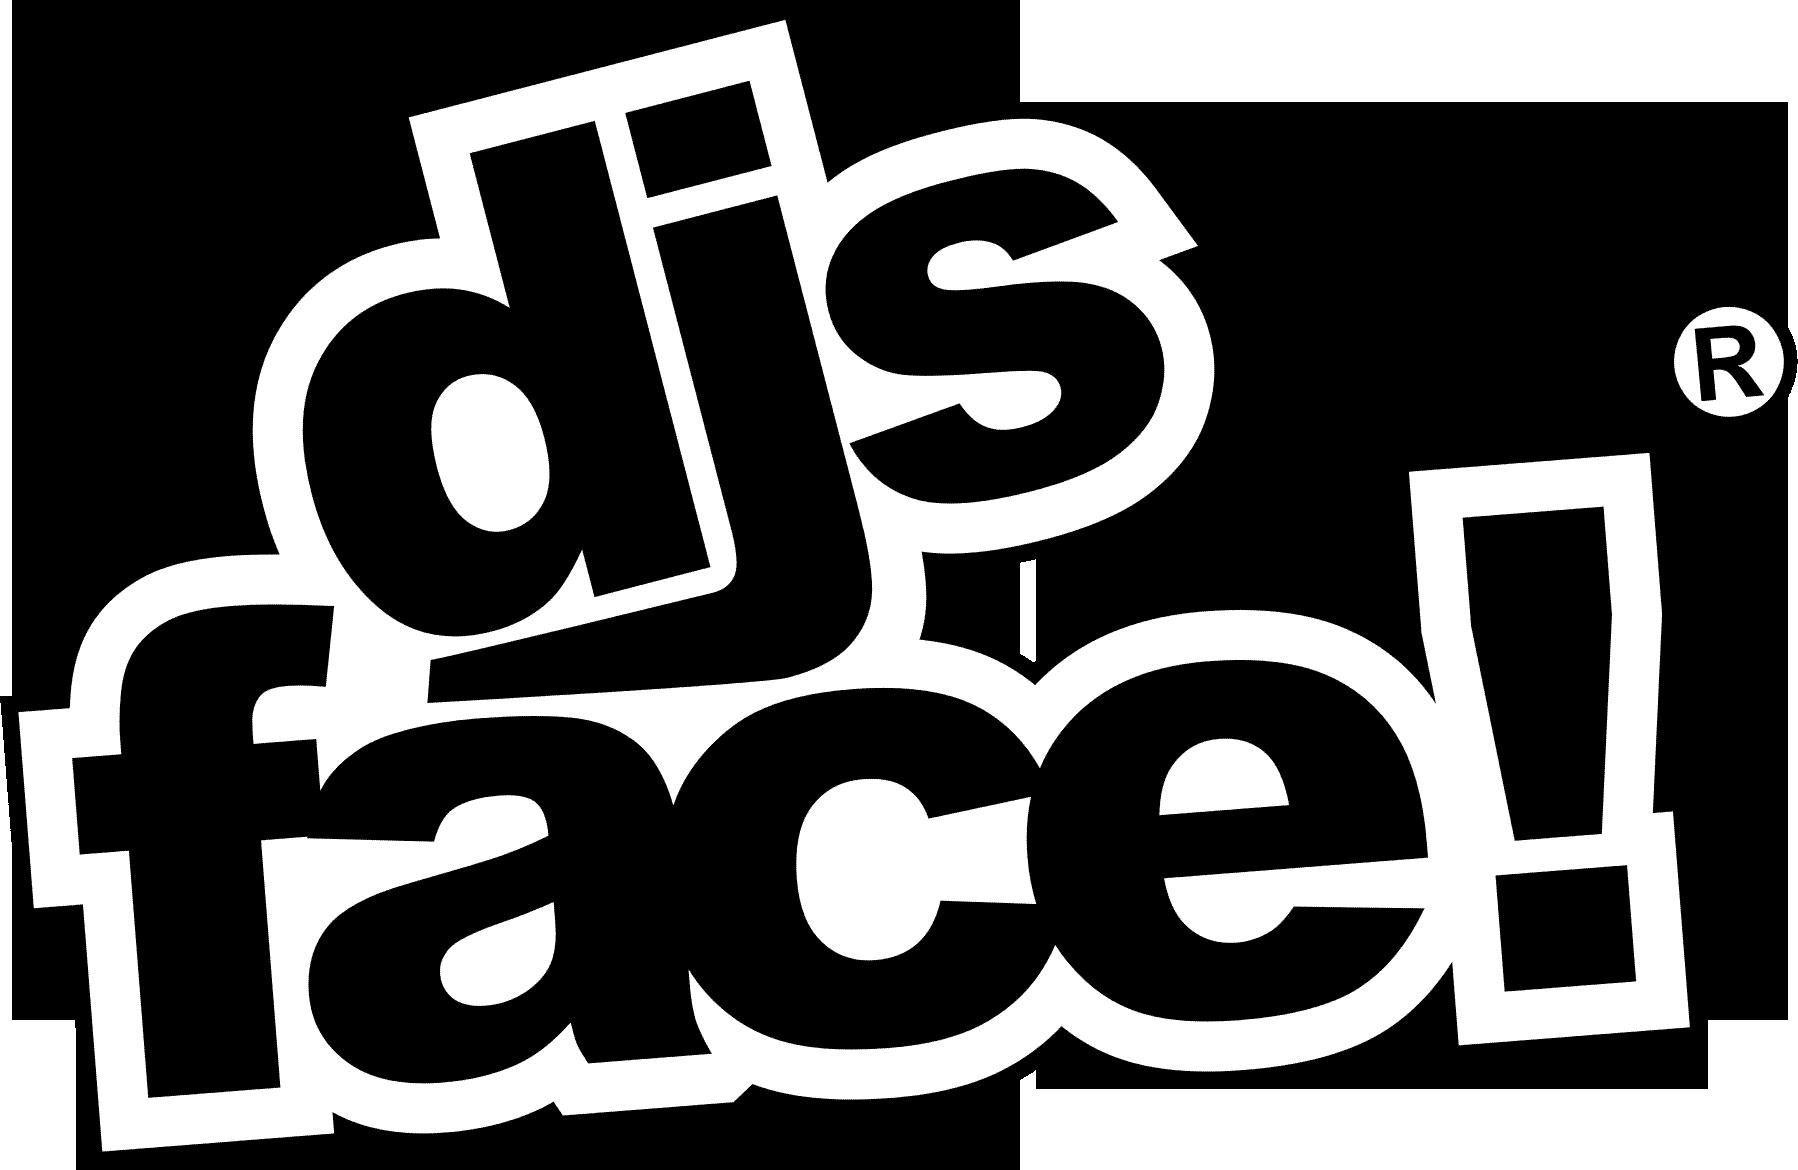 djs-face!®